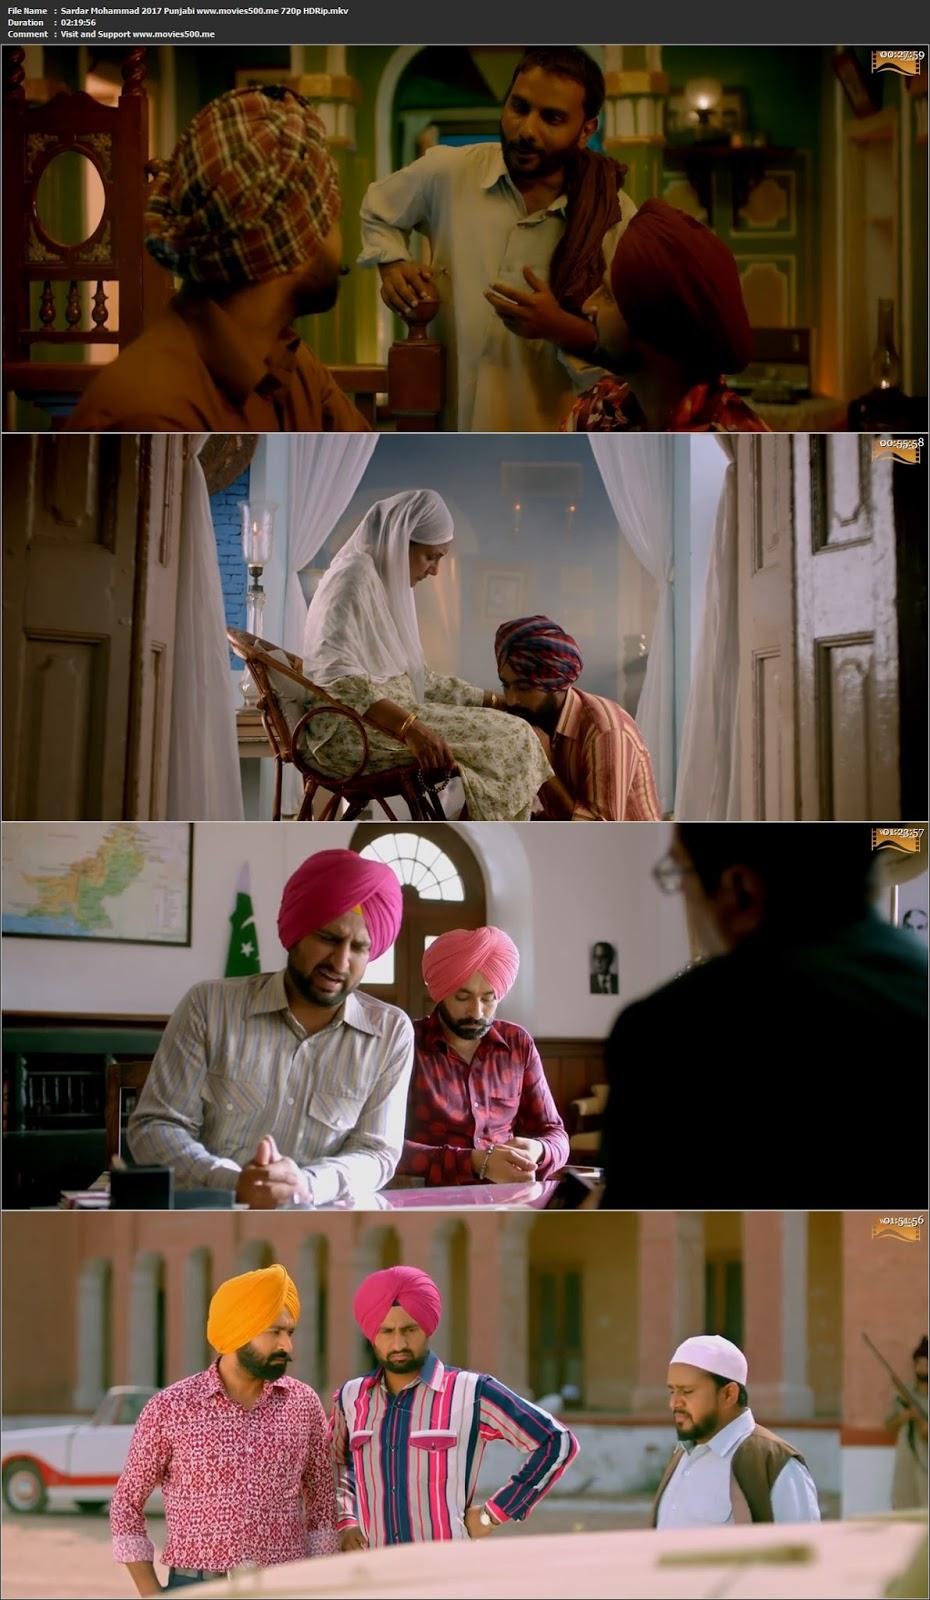 Sardar Mohammad 2017 Punjabi Full Movie HDRip 720p at movies500.me